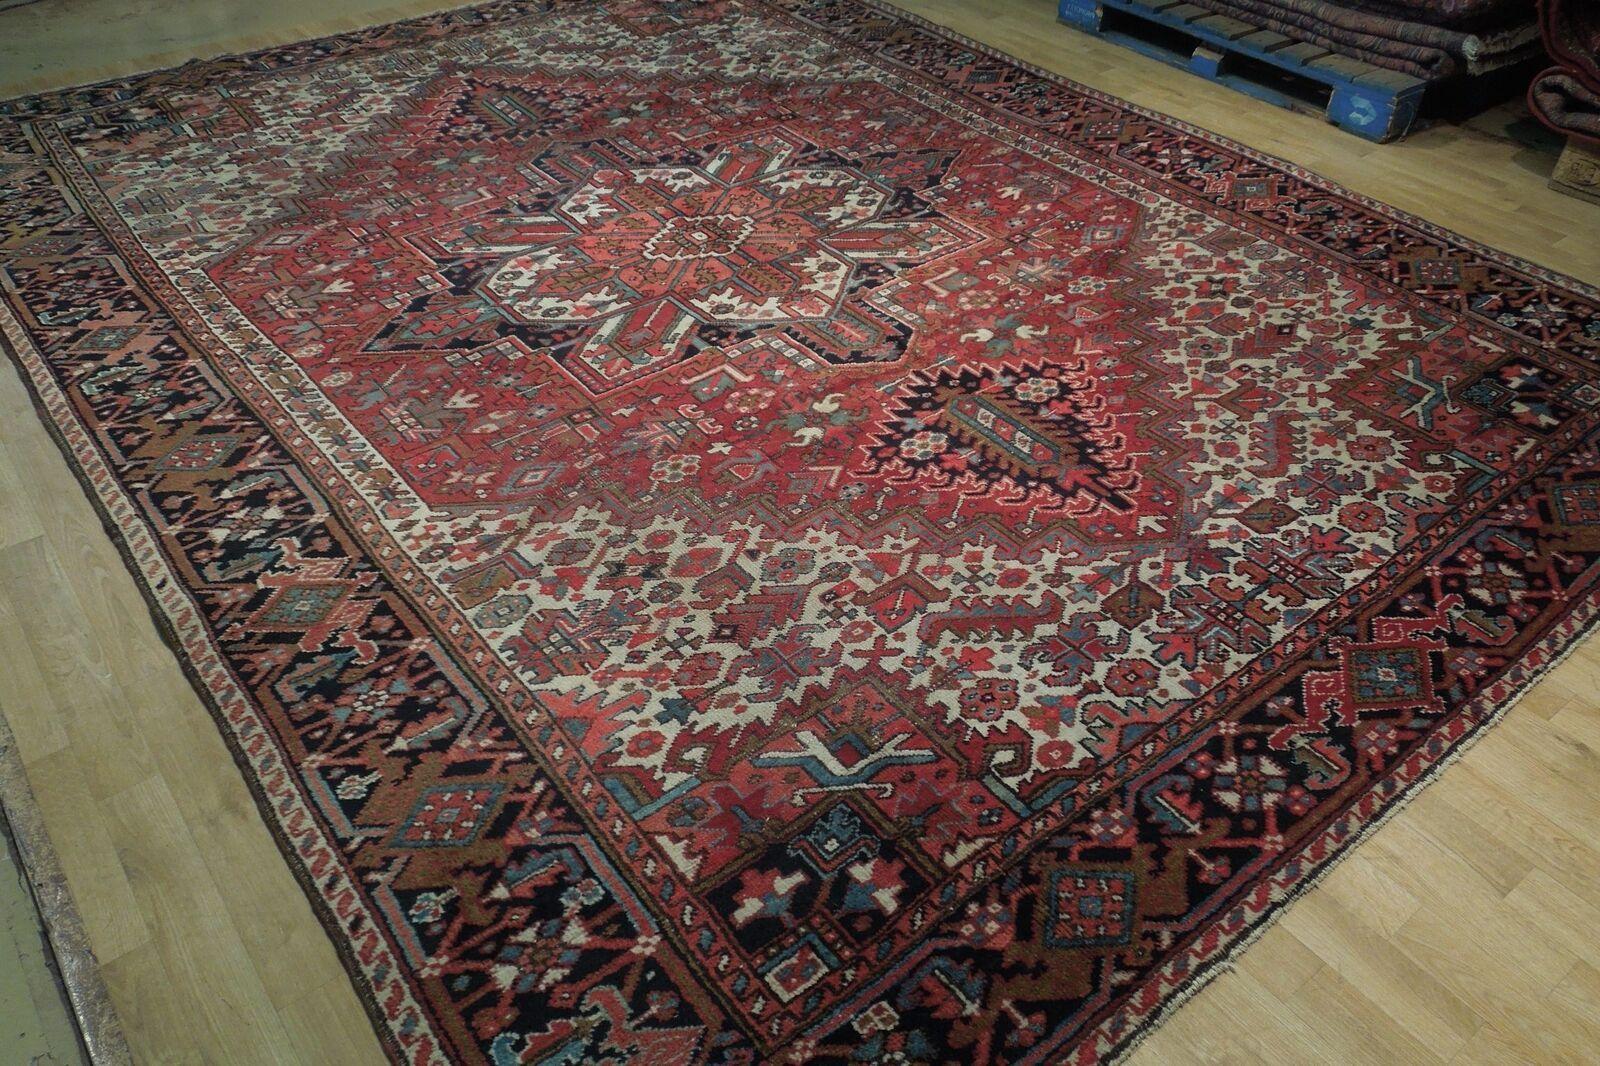 Normal Wear Semi-Antique Persian Handmade 9x12 Burgundy Heriz Wool Rug image 2